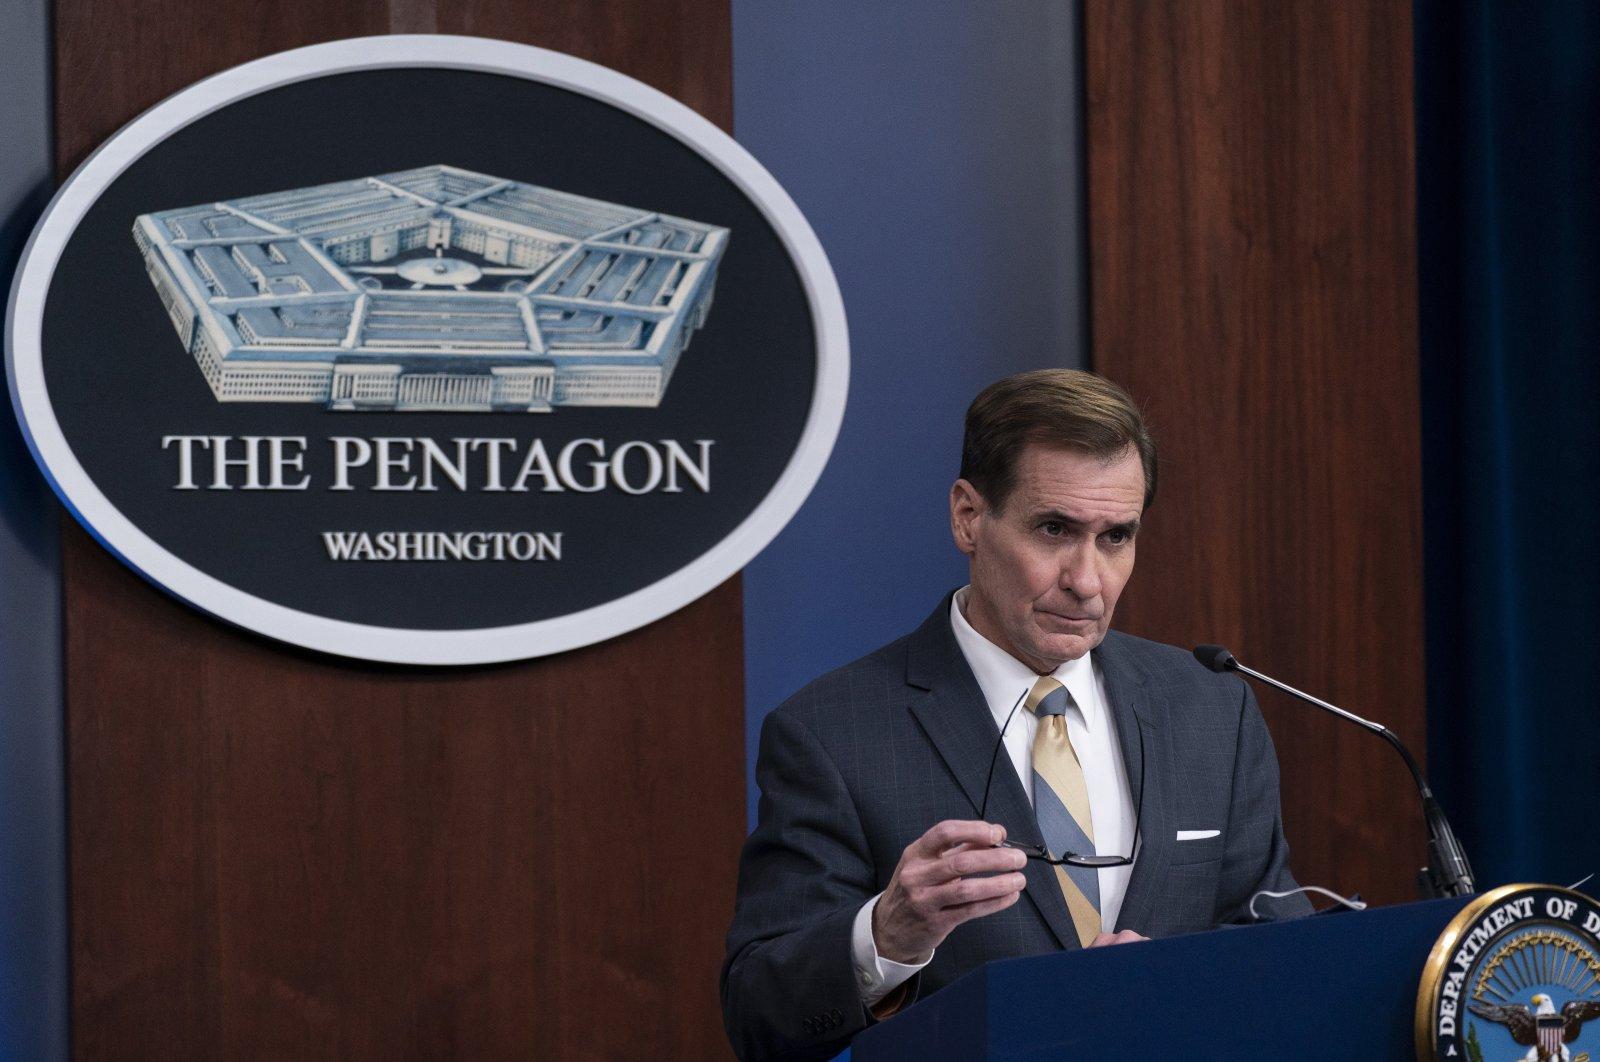 Pentagon spokesperson John Kirby speaks during a media briefing at the Pentagon in Washington, D.C., U.S., Feb. 8, 2021. (AP Photo)